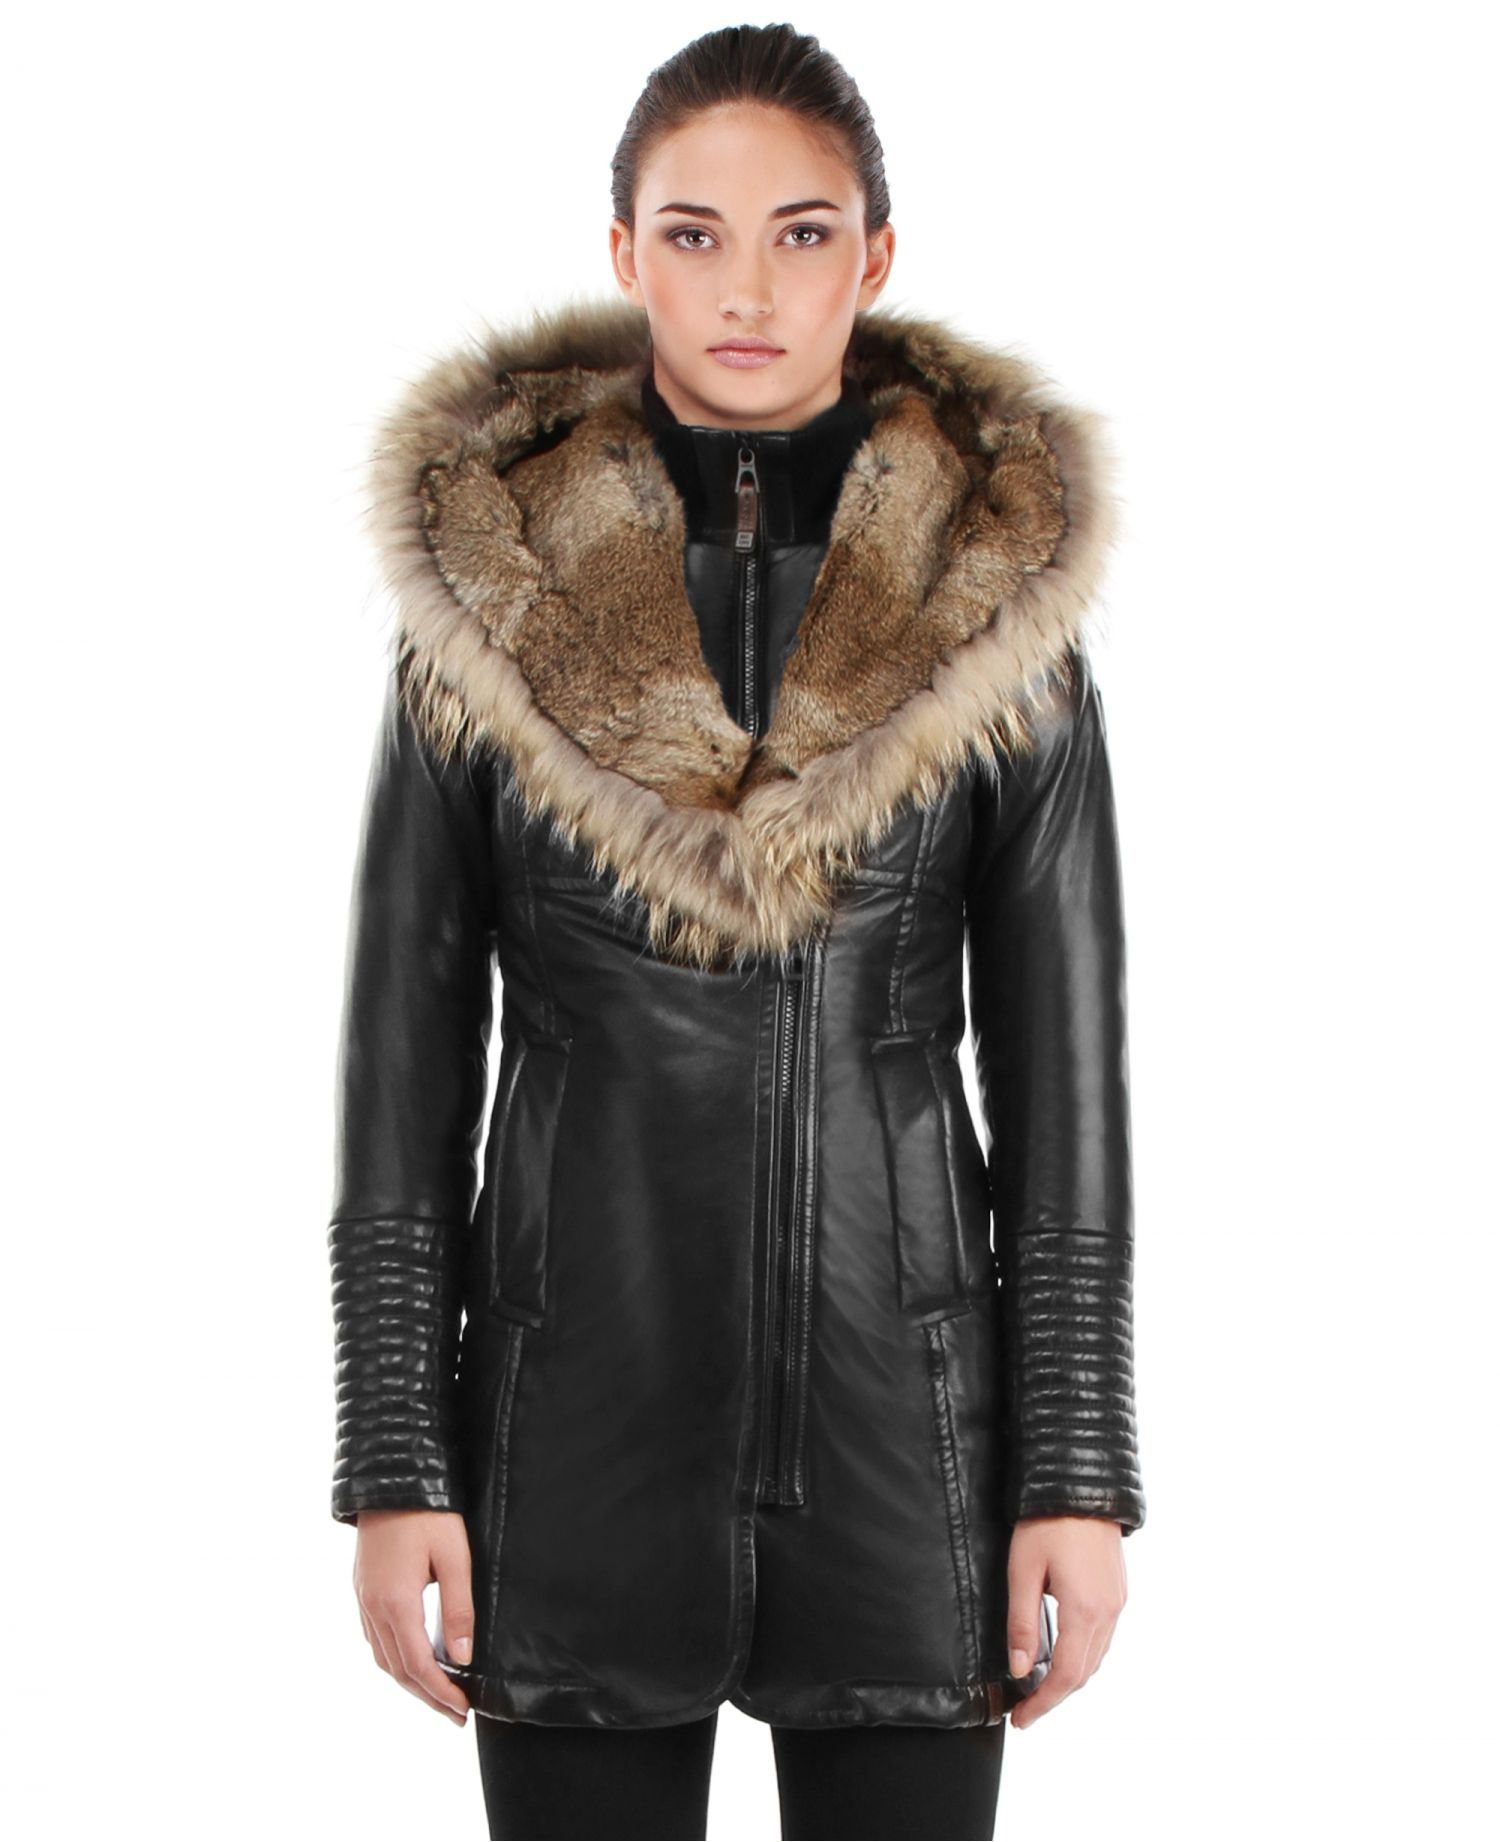 Love it rudsak catwalk pinterest coats catwalks and fall